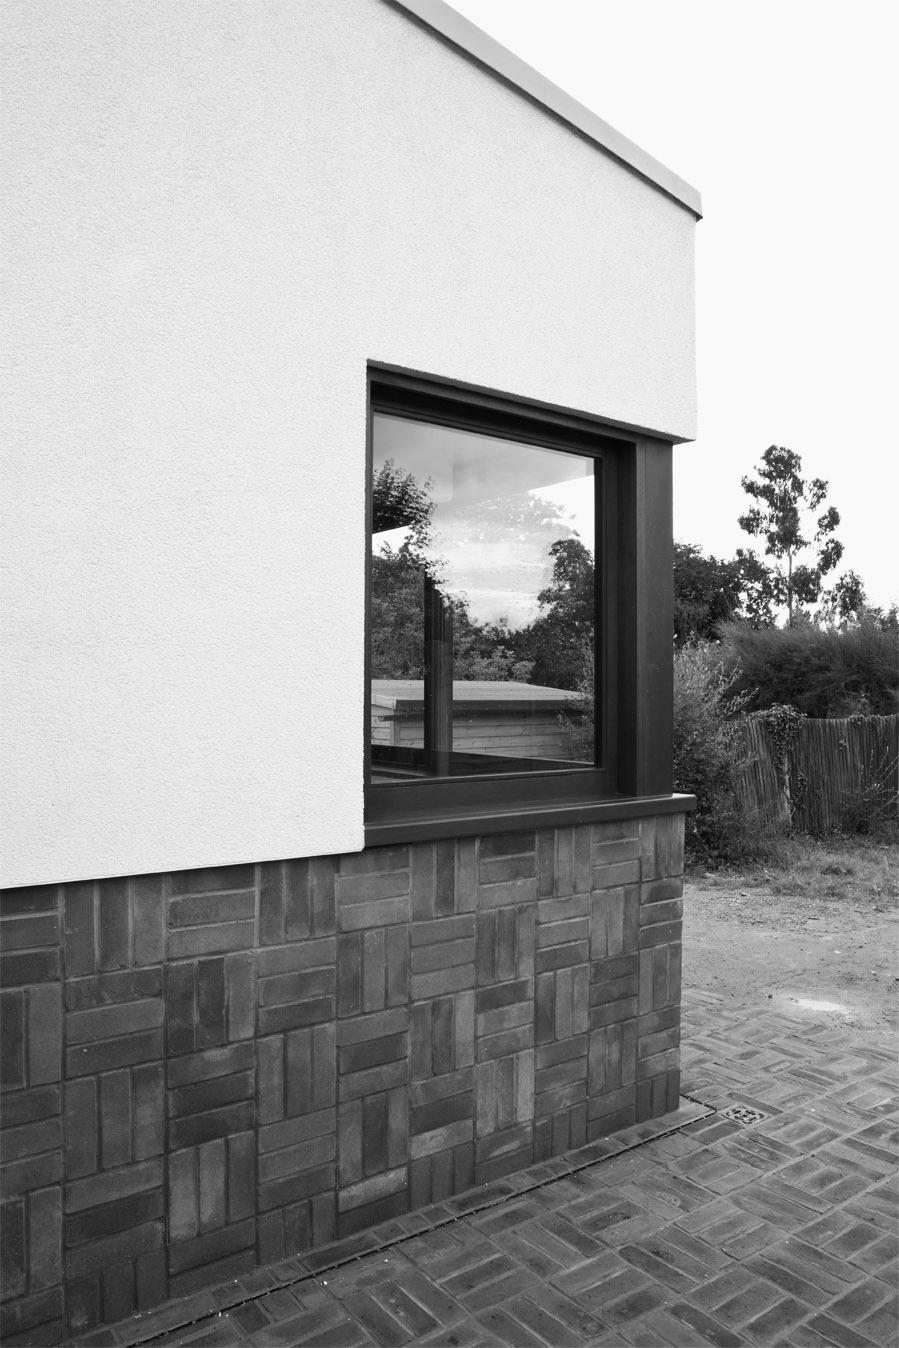 MOCT_house_extension_barnham rd_bw_image14.jpg